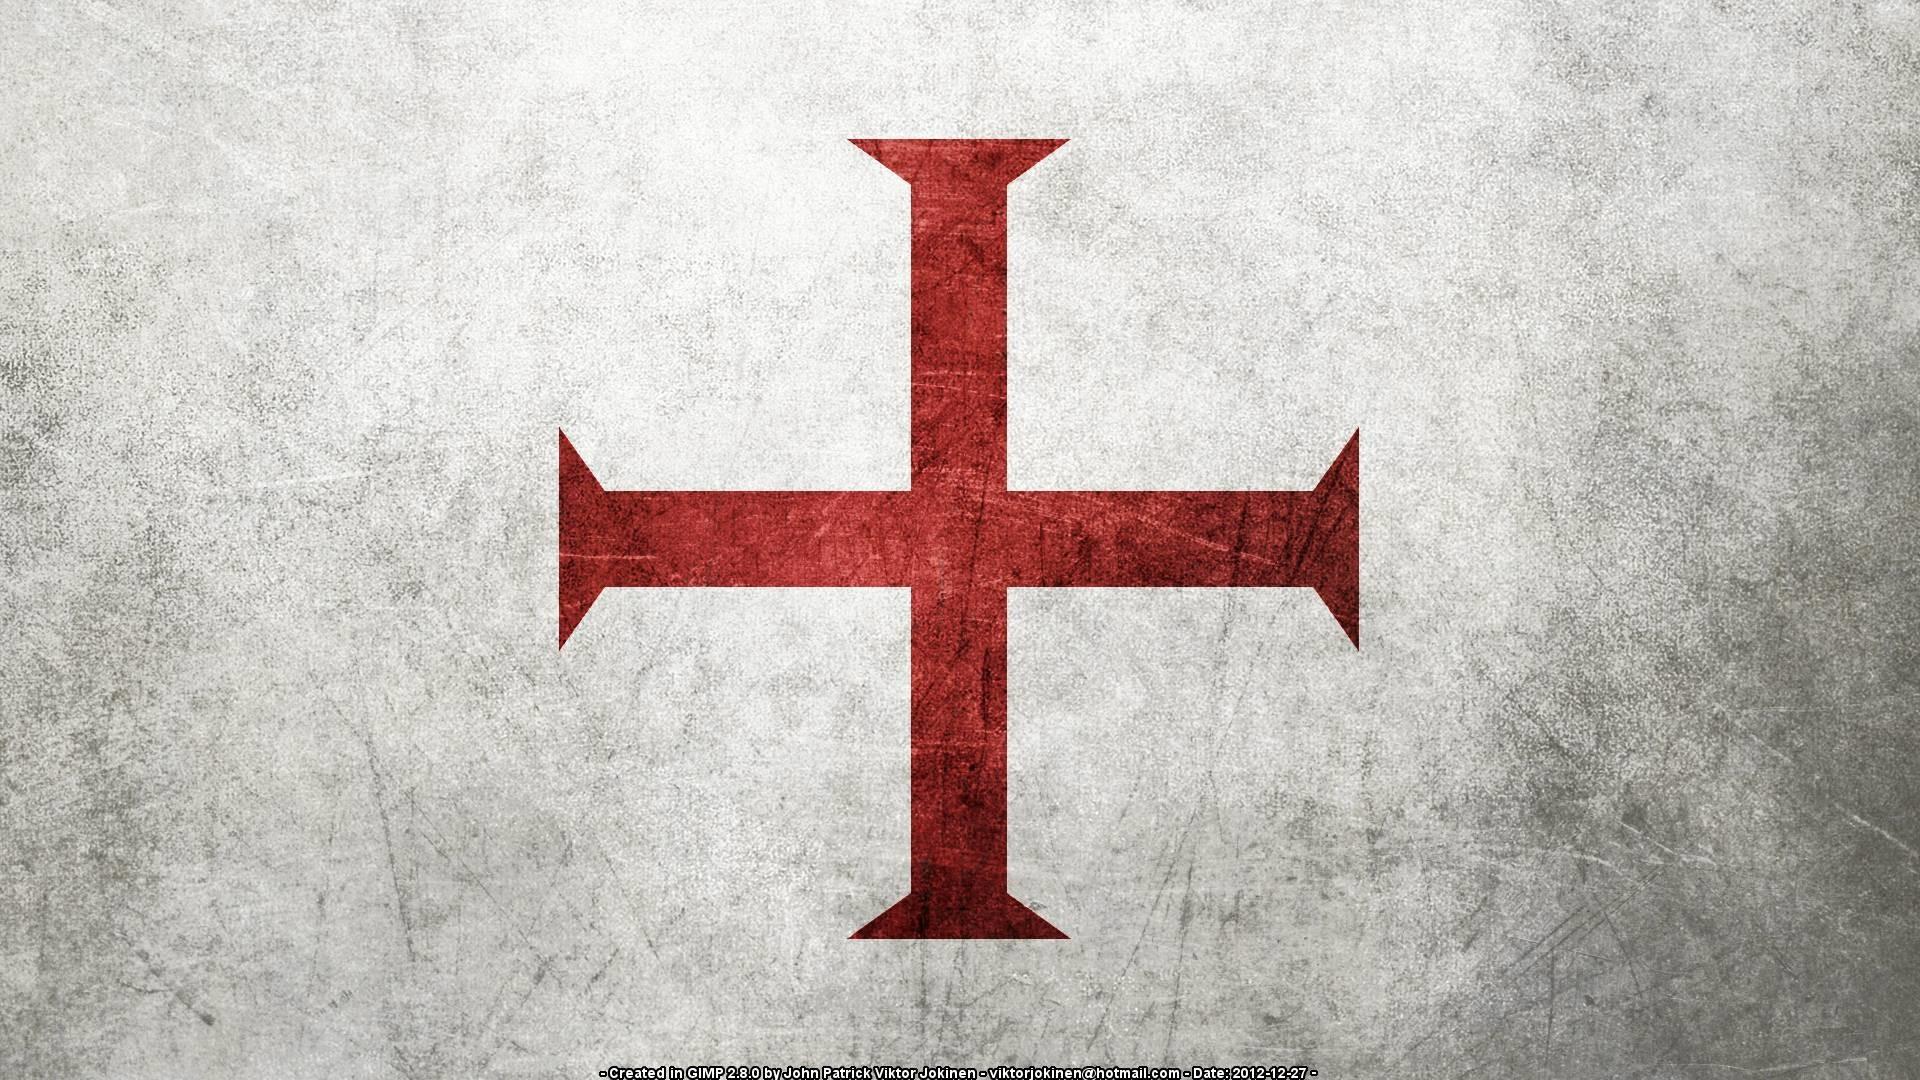 Knights Templar Wallpaper 71 images 1920x1080